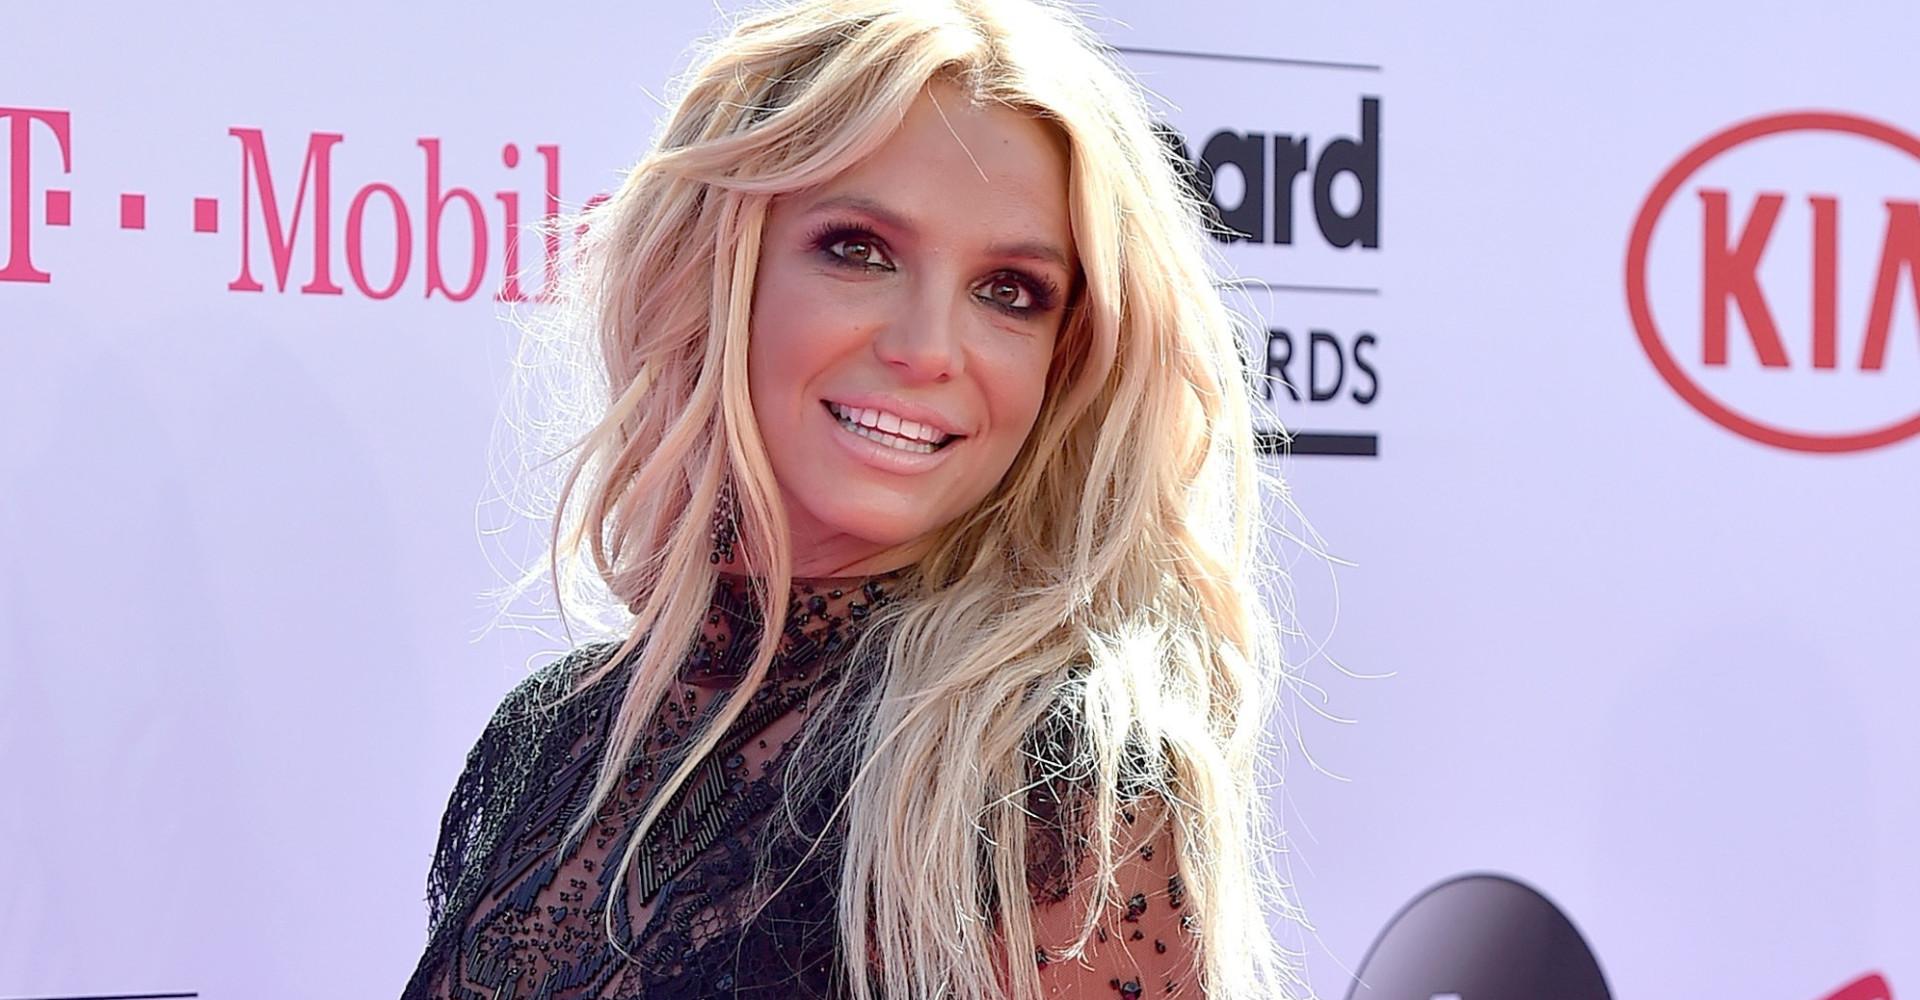 Britney Spears está internada em clínica de saúde mental